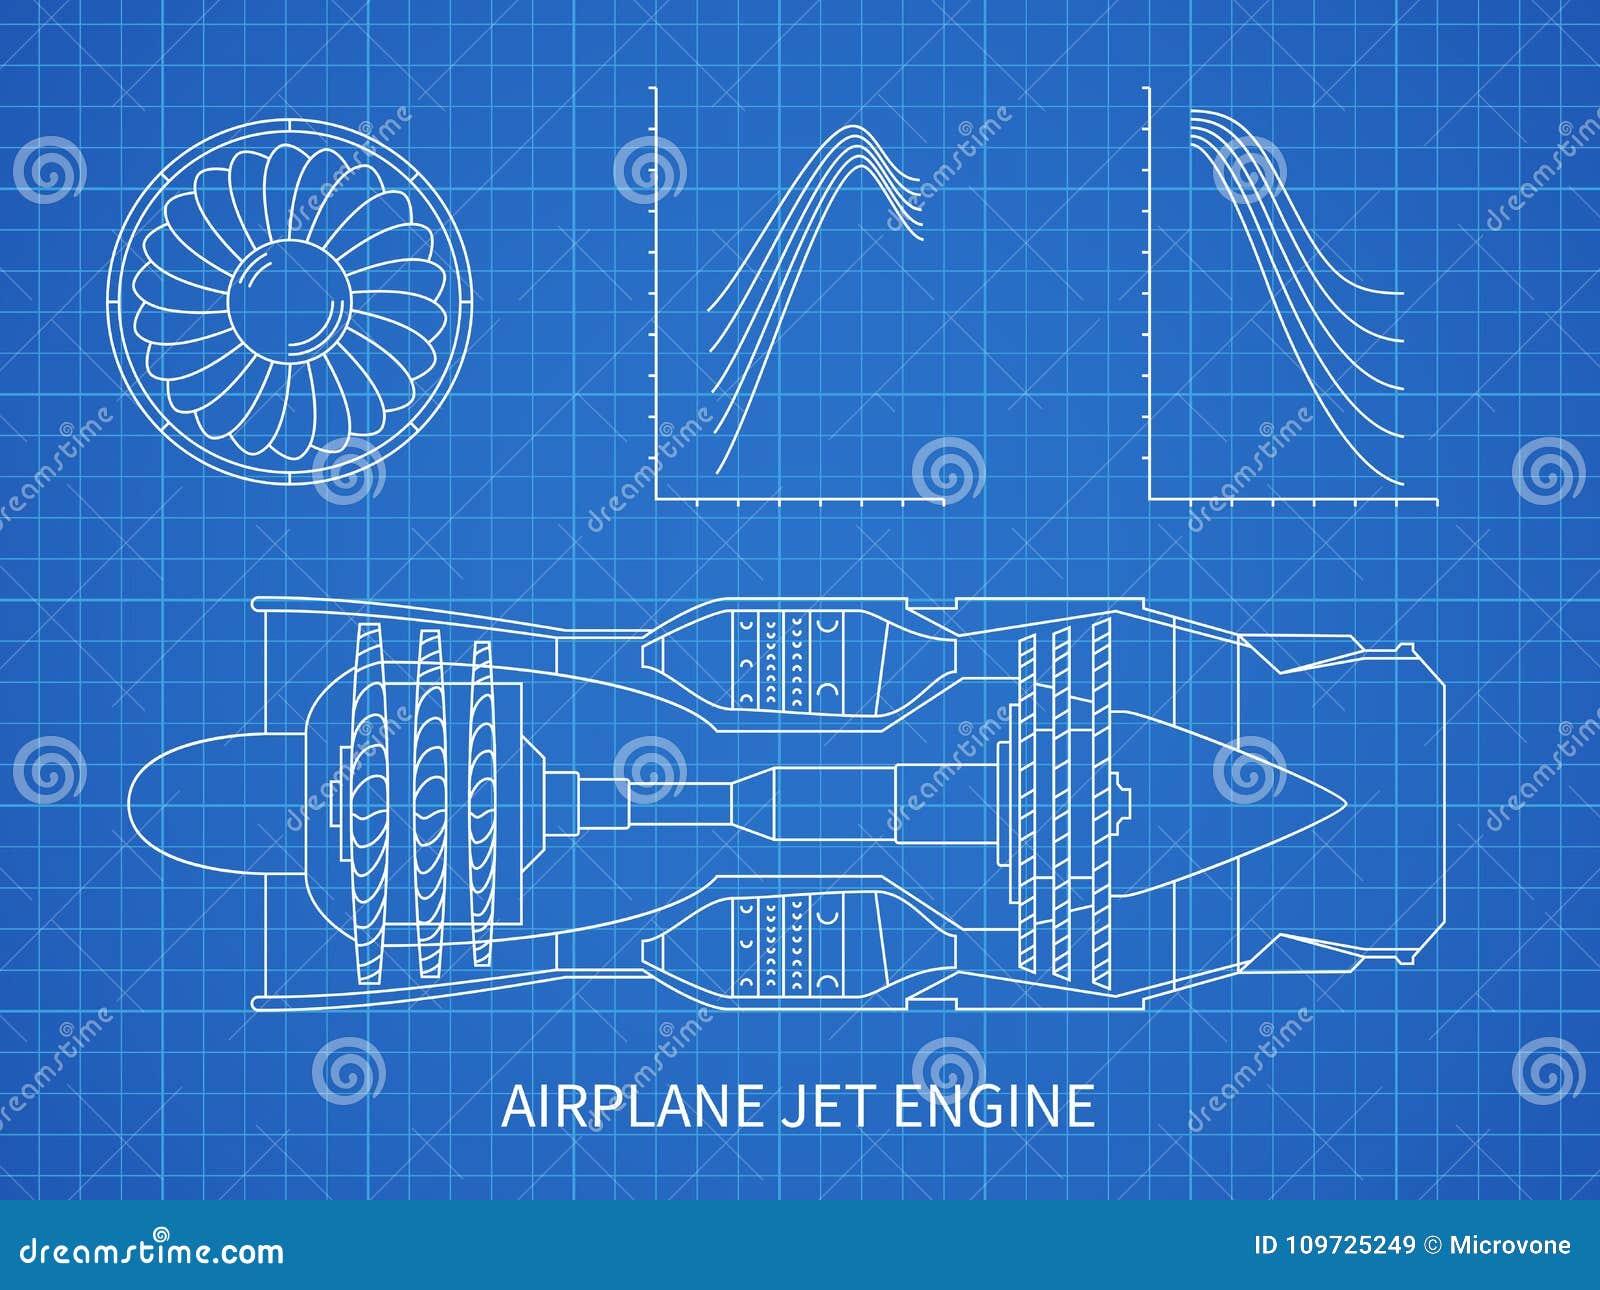 Airplane jet engine with turbine vector blueprint design stock airplane jet engine with turbine vector blueprint design stock vector illustration of isolated mechanical 109725249 malvernweather Choice Image